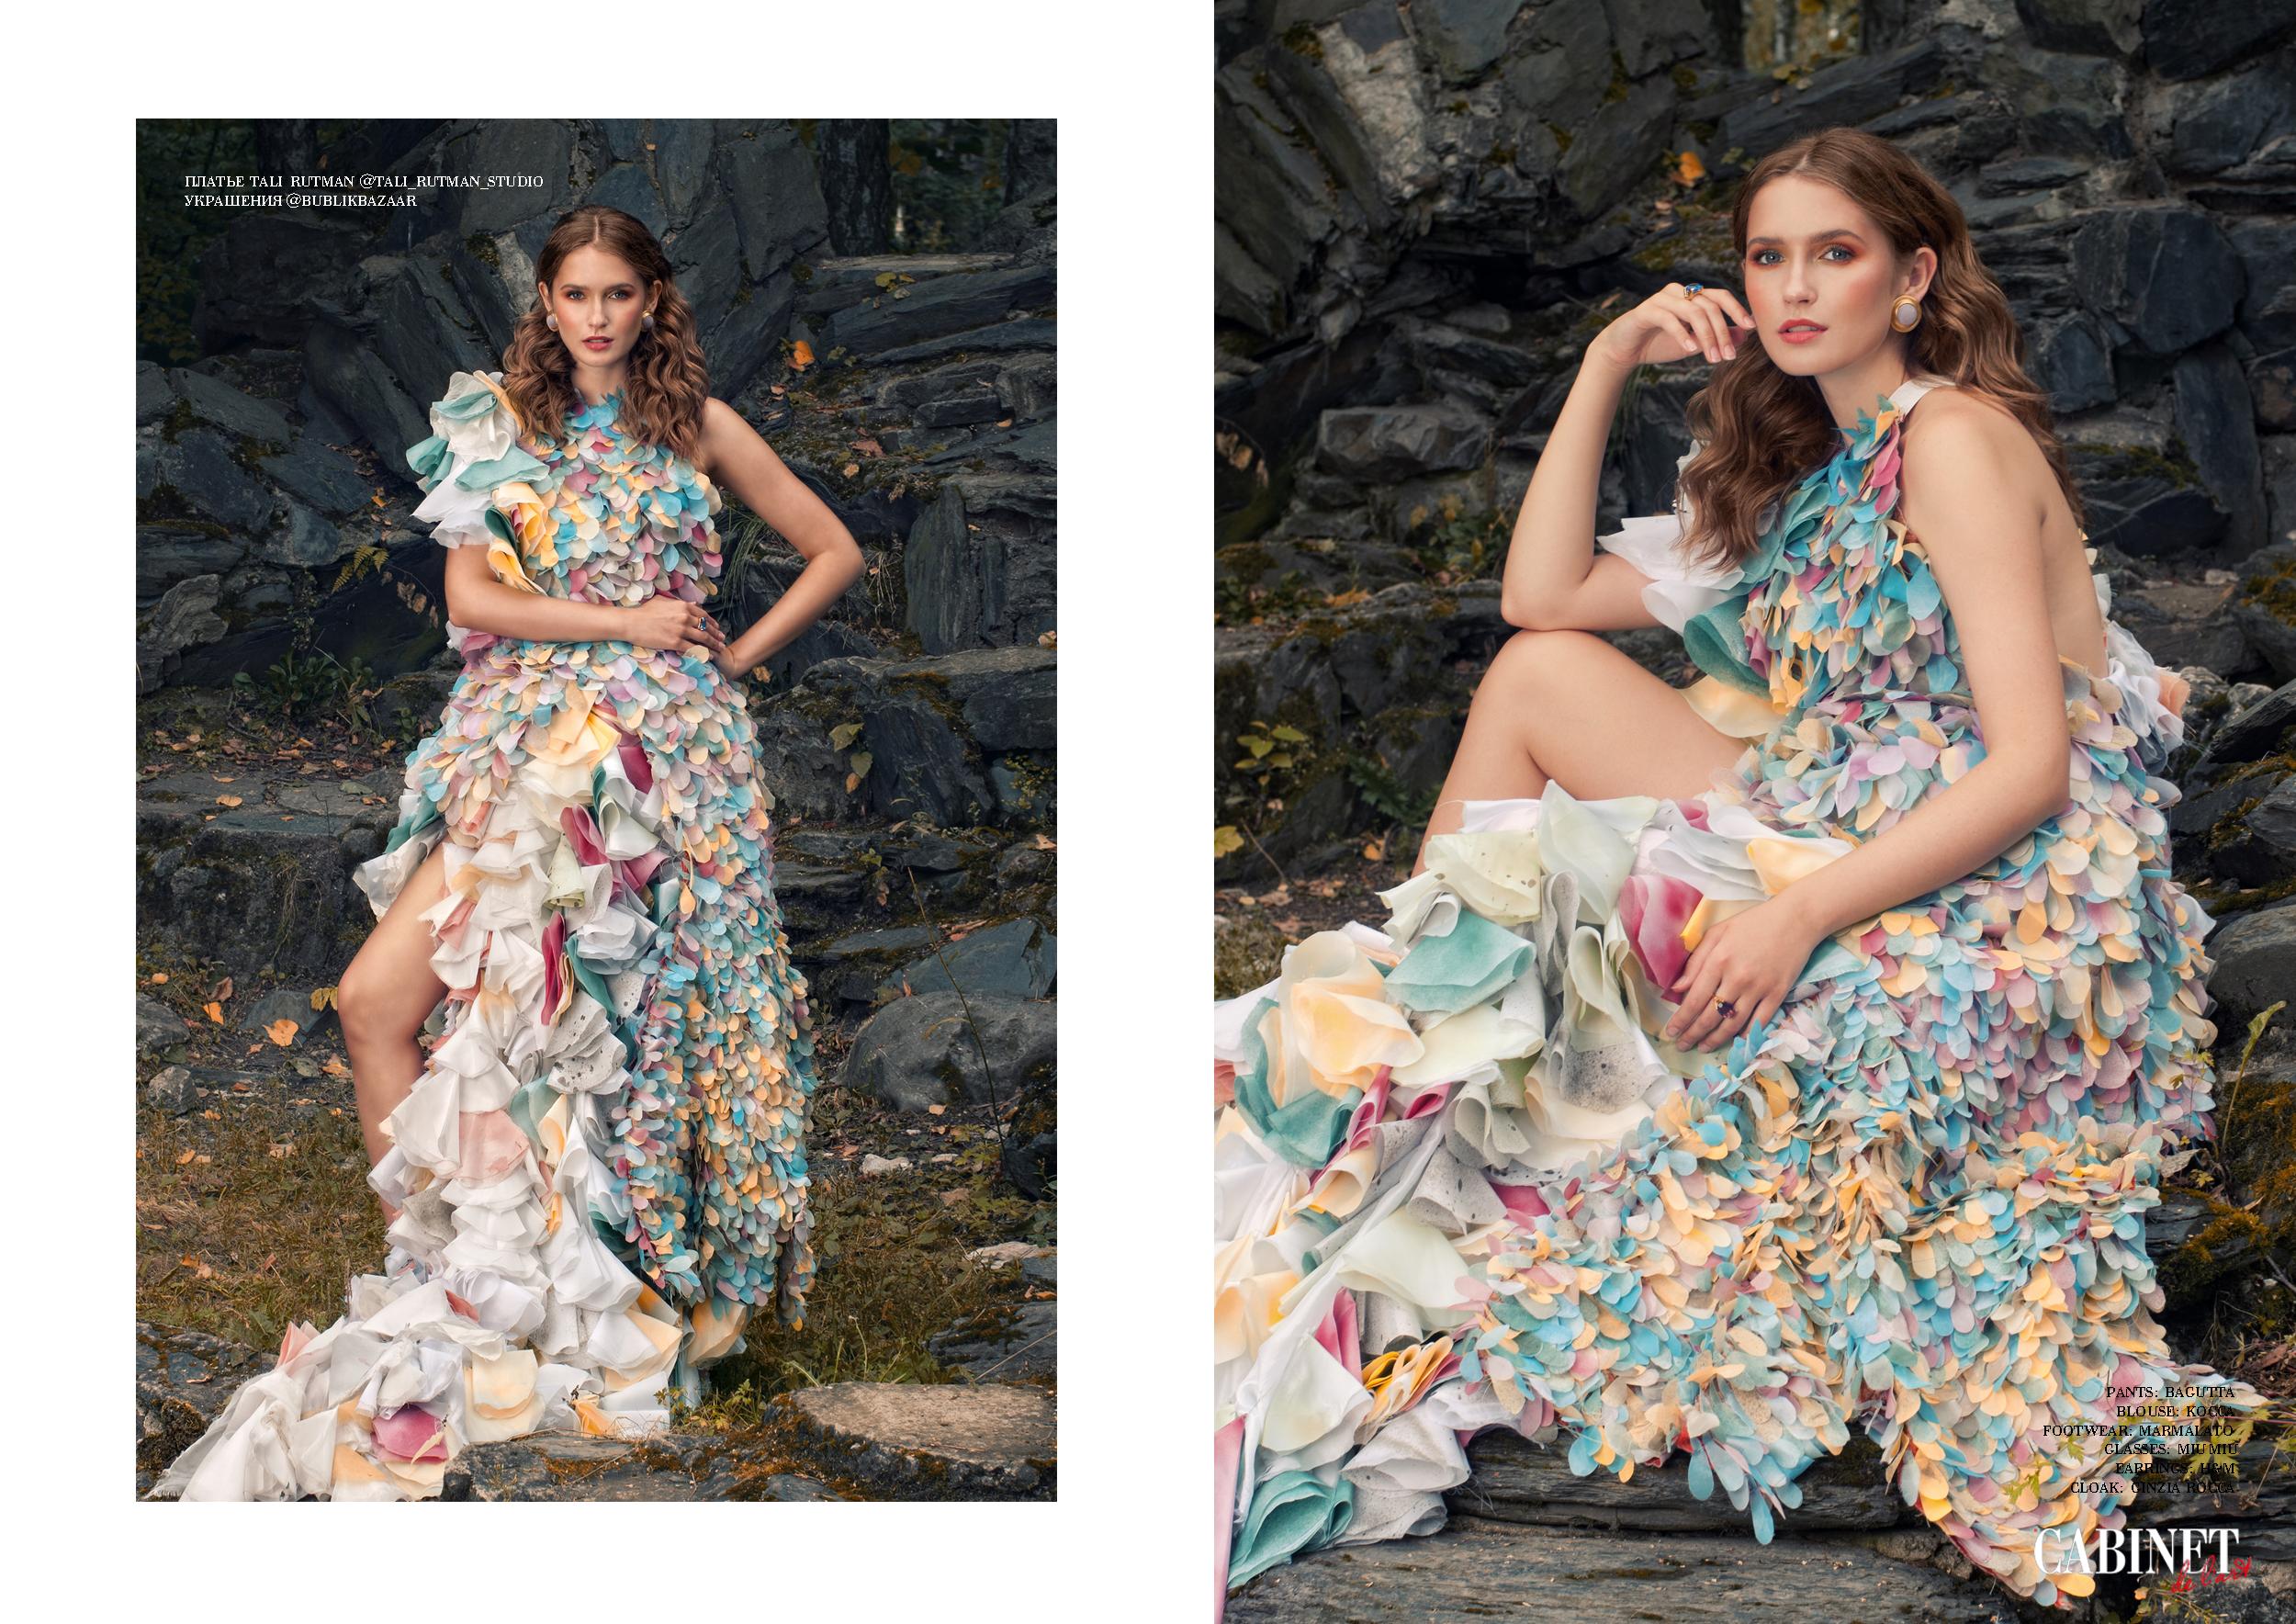 Платье Tali Rutman @tali_rutman_studio, украшения @bublikbazaar